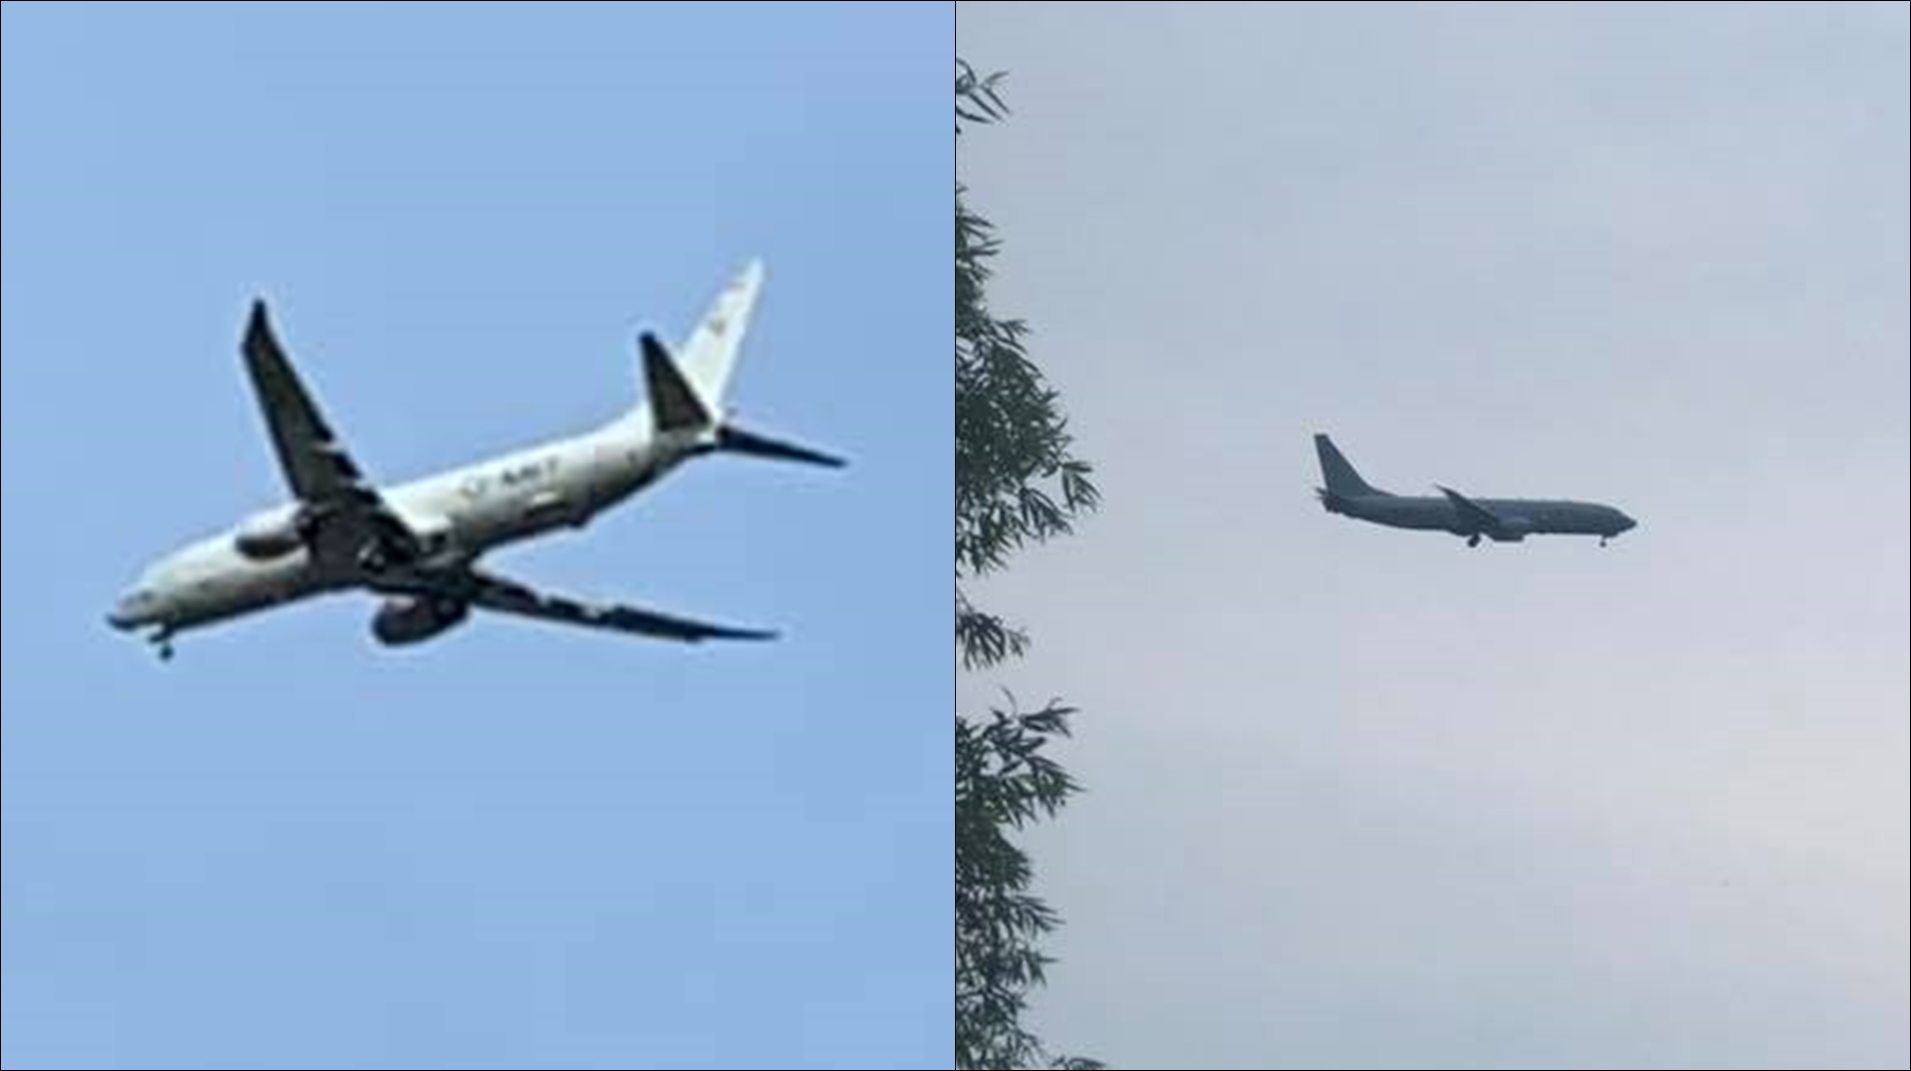 tri navy planes_1559611445035.jpg.jpg